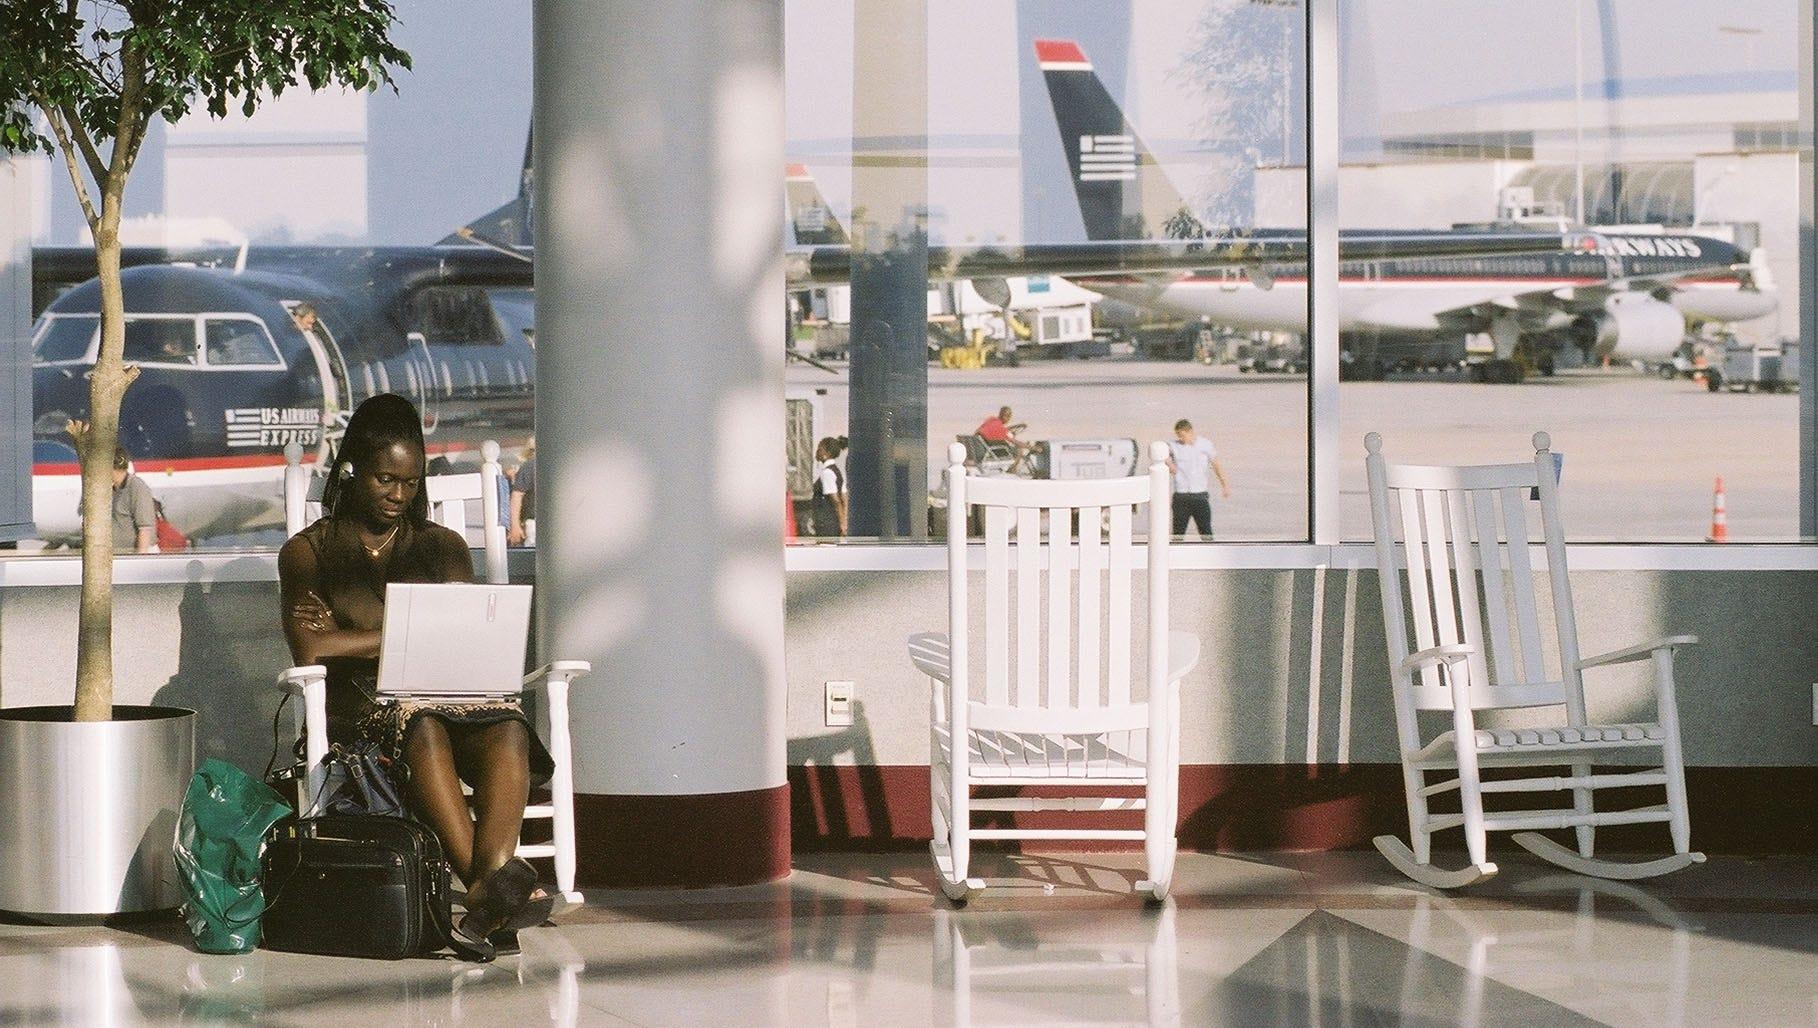 Remarkable Charlotte Douglas International Airport Evergreenethics Interior Chair Design Evergreenethicsorg